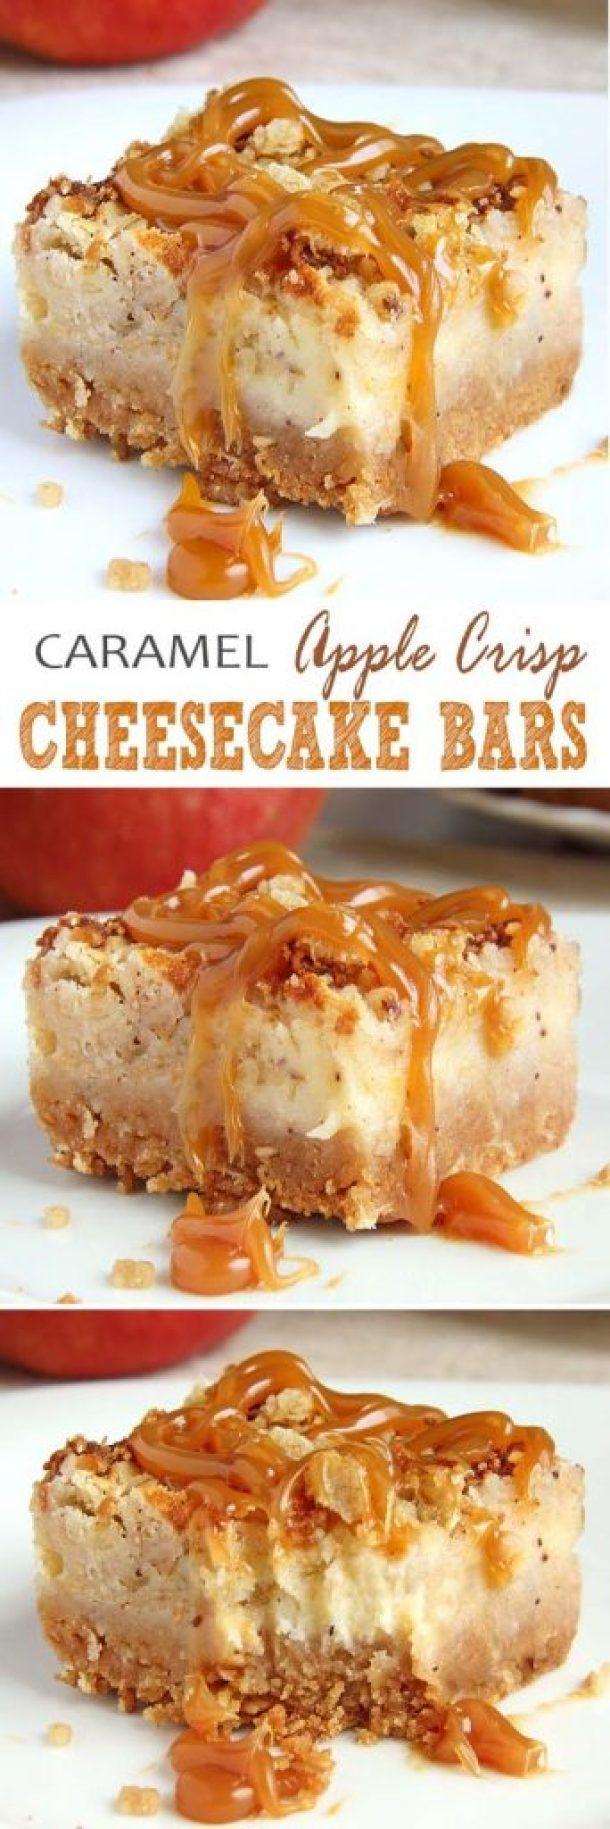 Caramel Apple Crisp Cheesecake Bars Recipe | Sugar Apron - Apple Recipes